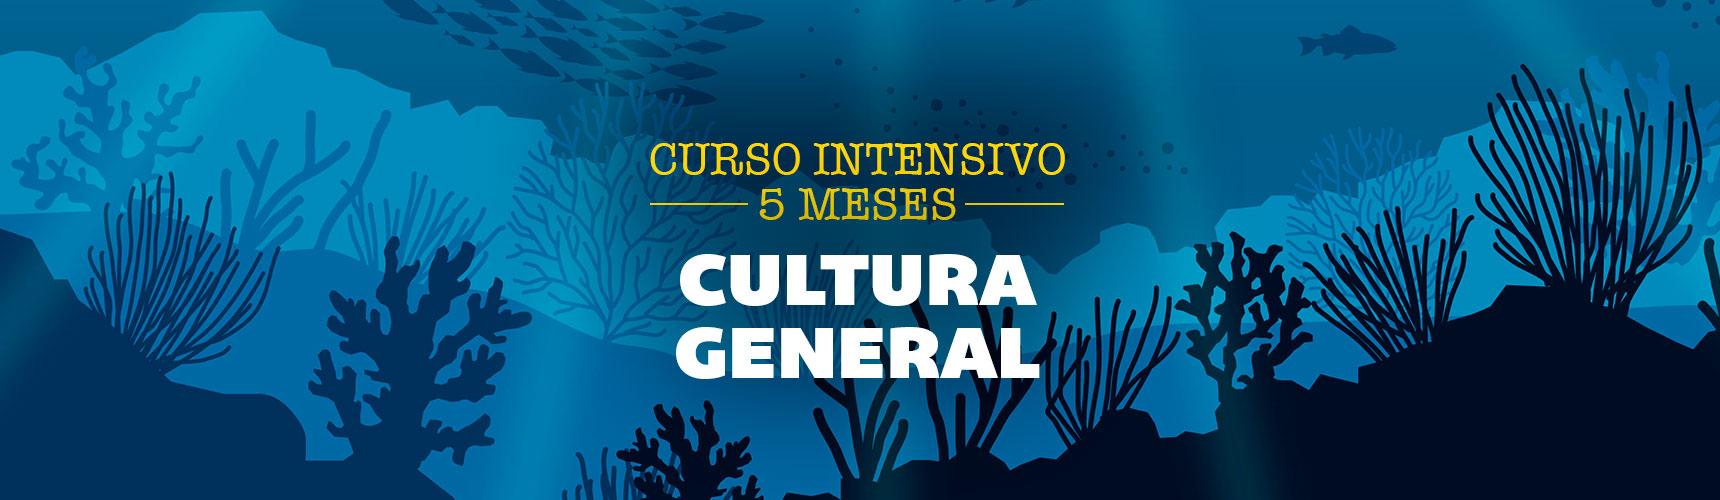 5meses_CULT_Pupitre_cursos_portada-web_nuevas-fotos_1720x910